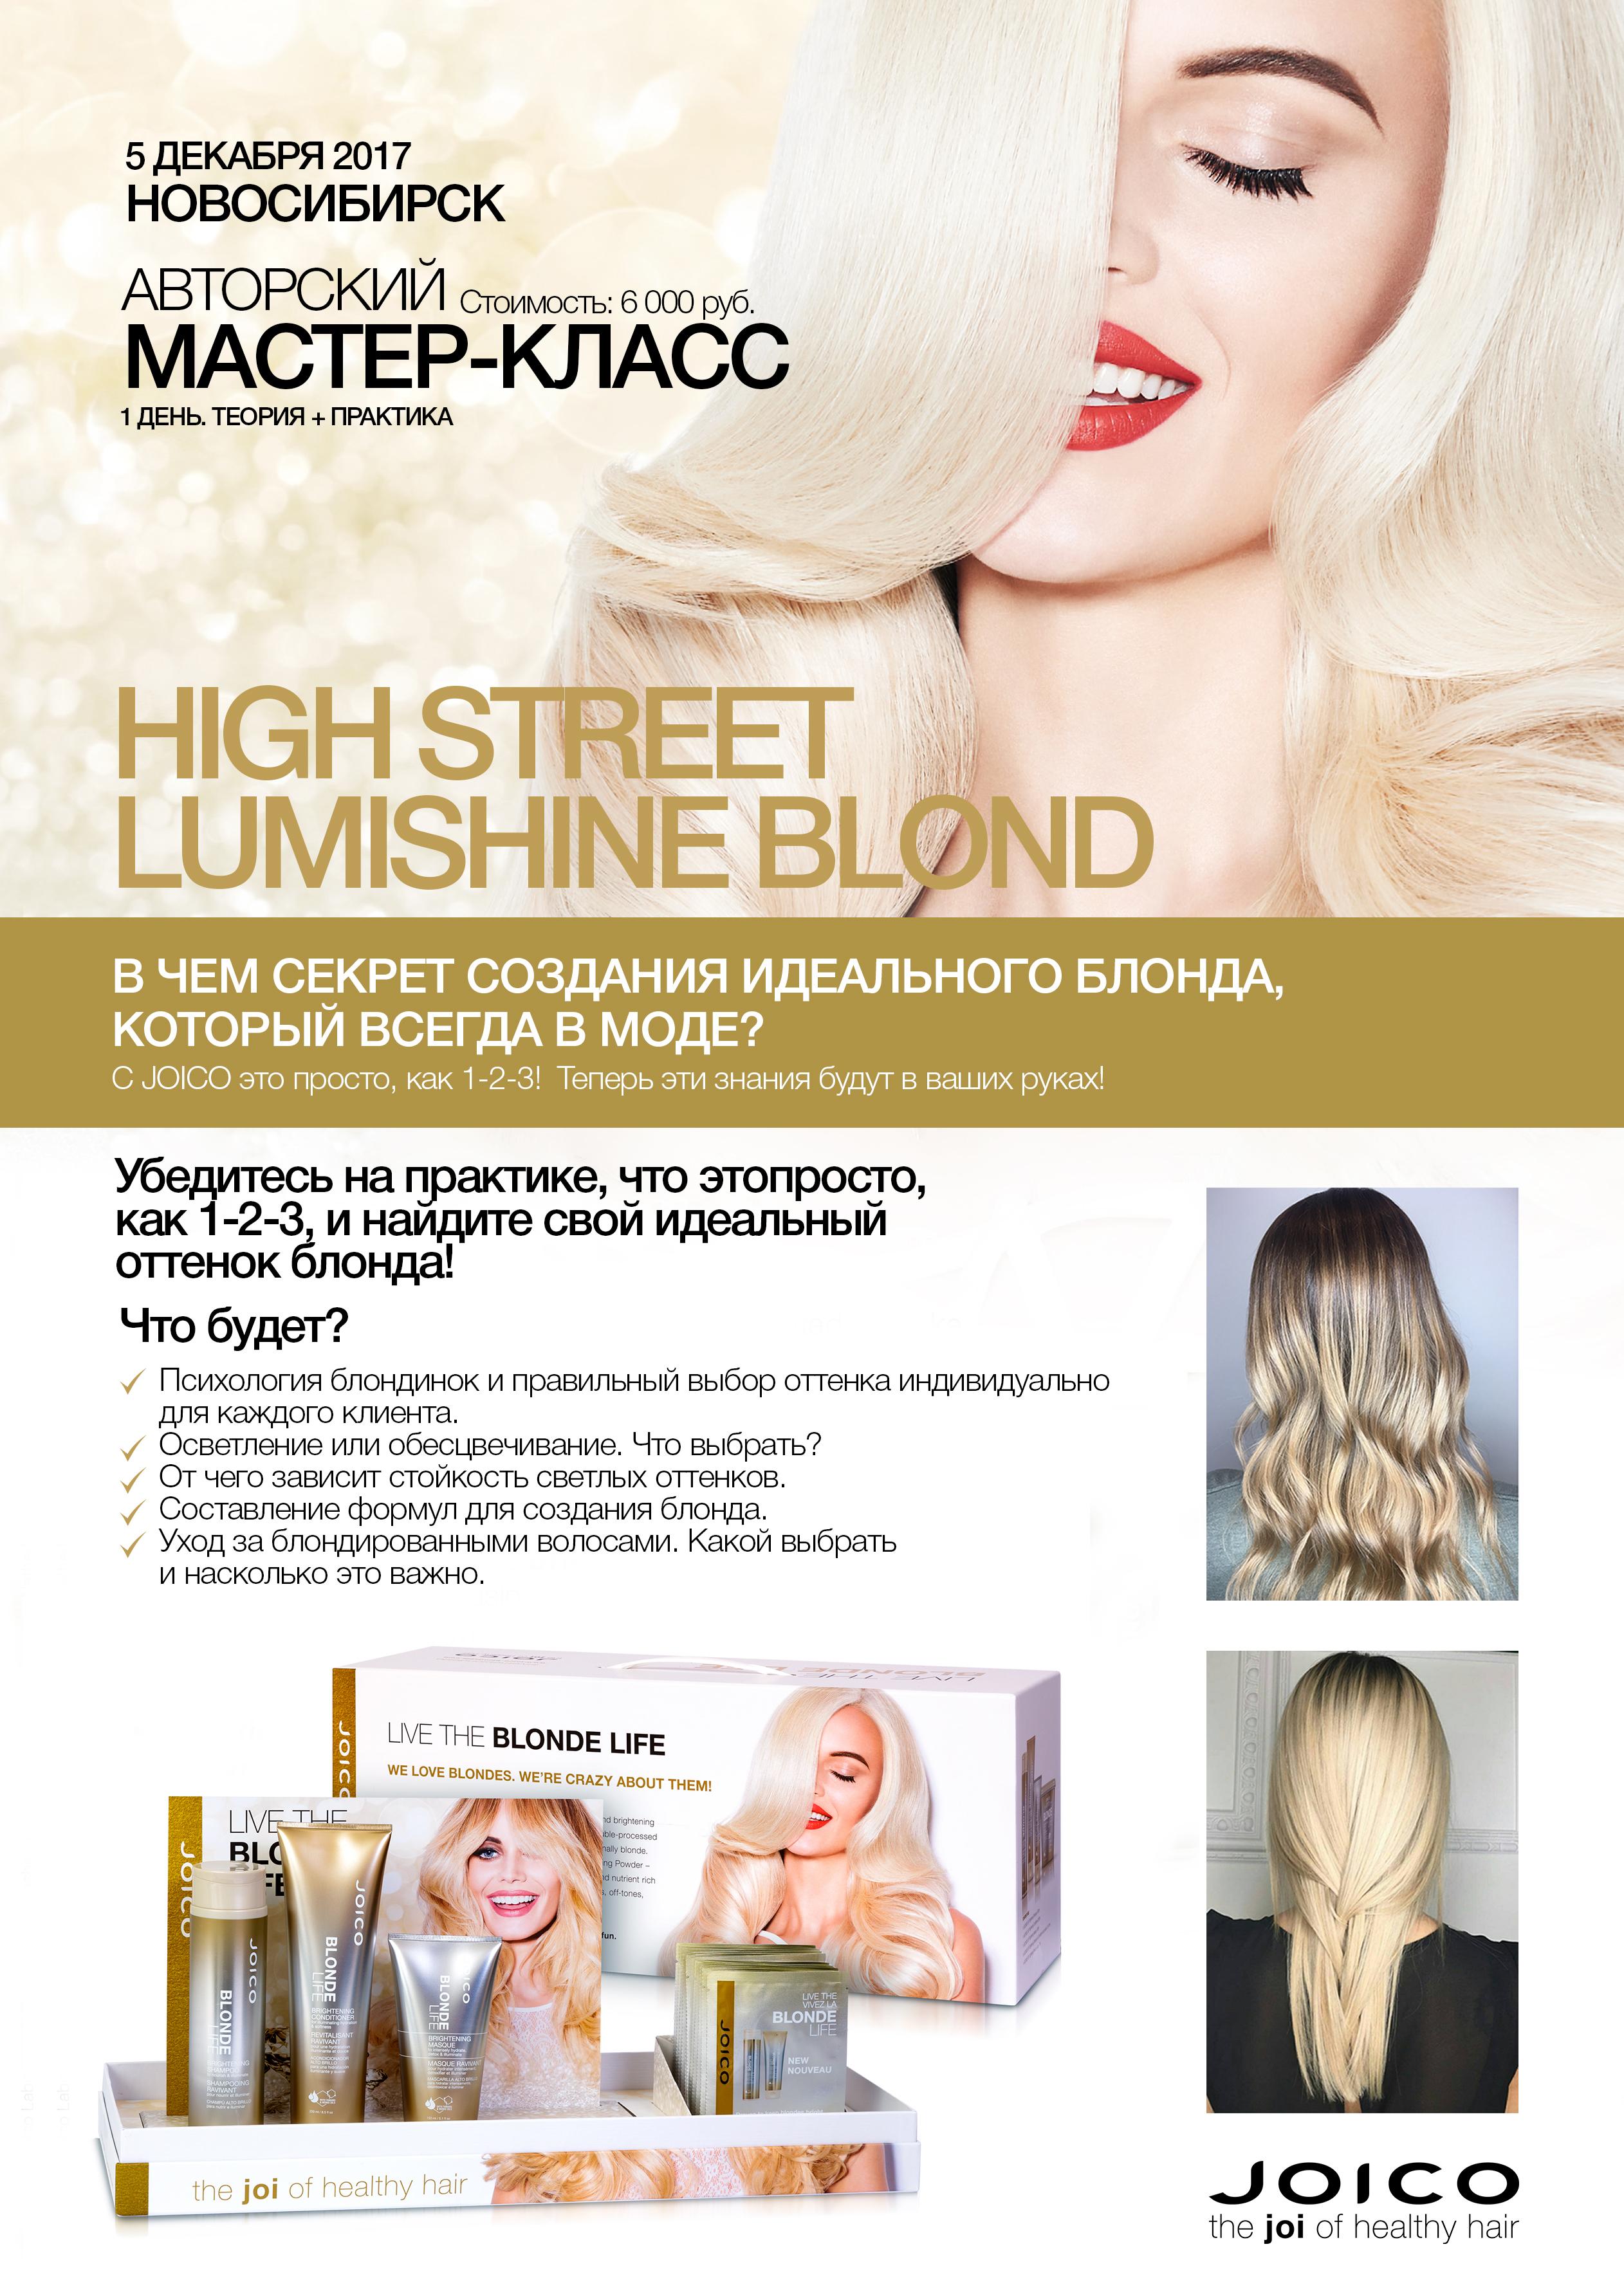 High Street Lumishine Blond